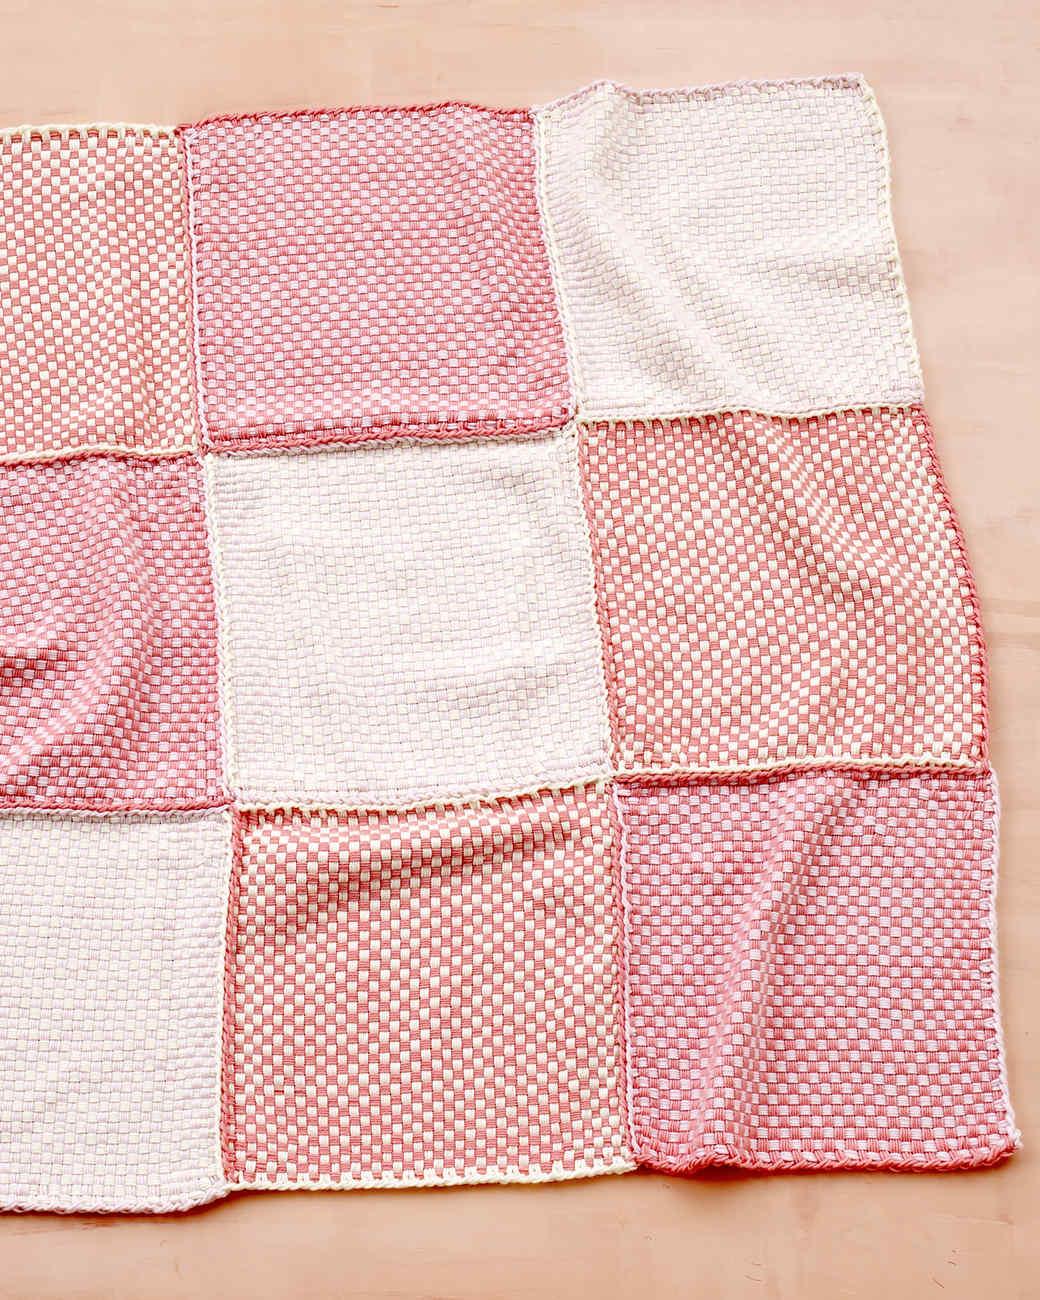 Martha Stewart Crafts Lion Brand® Yarn Extra Soft Wool Blend Loom-Woven Pretty Pink Baby Throw